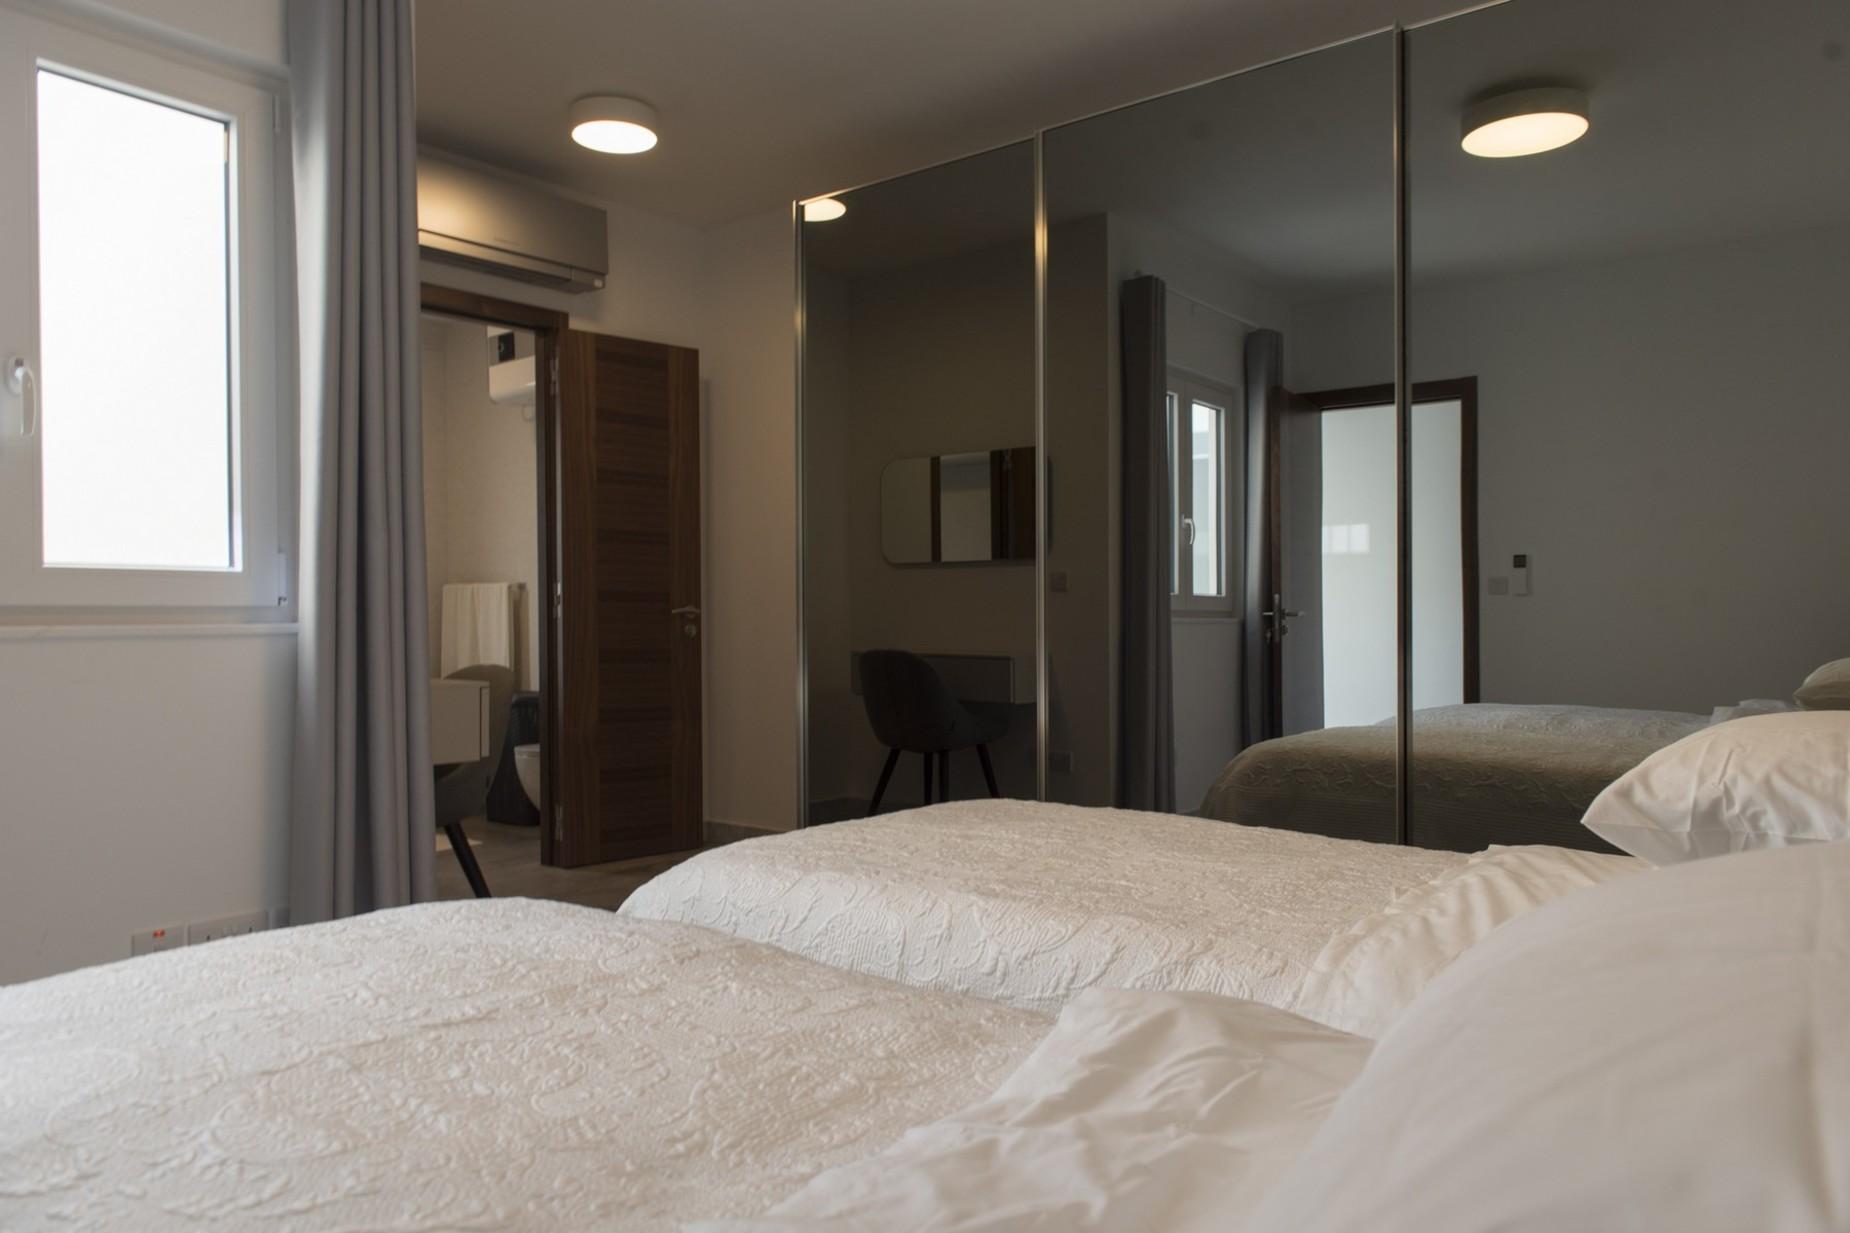 3 bed Villa For Rent in Ibragg, Ibragg - thumb 9